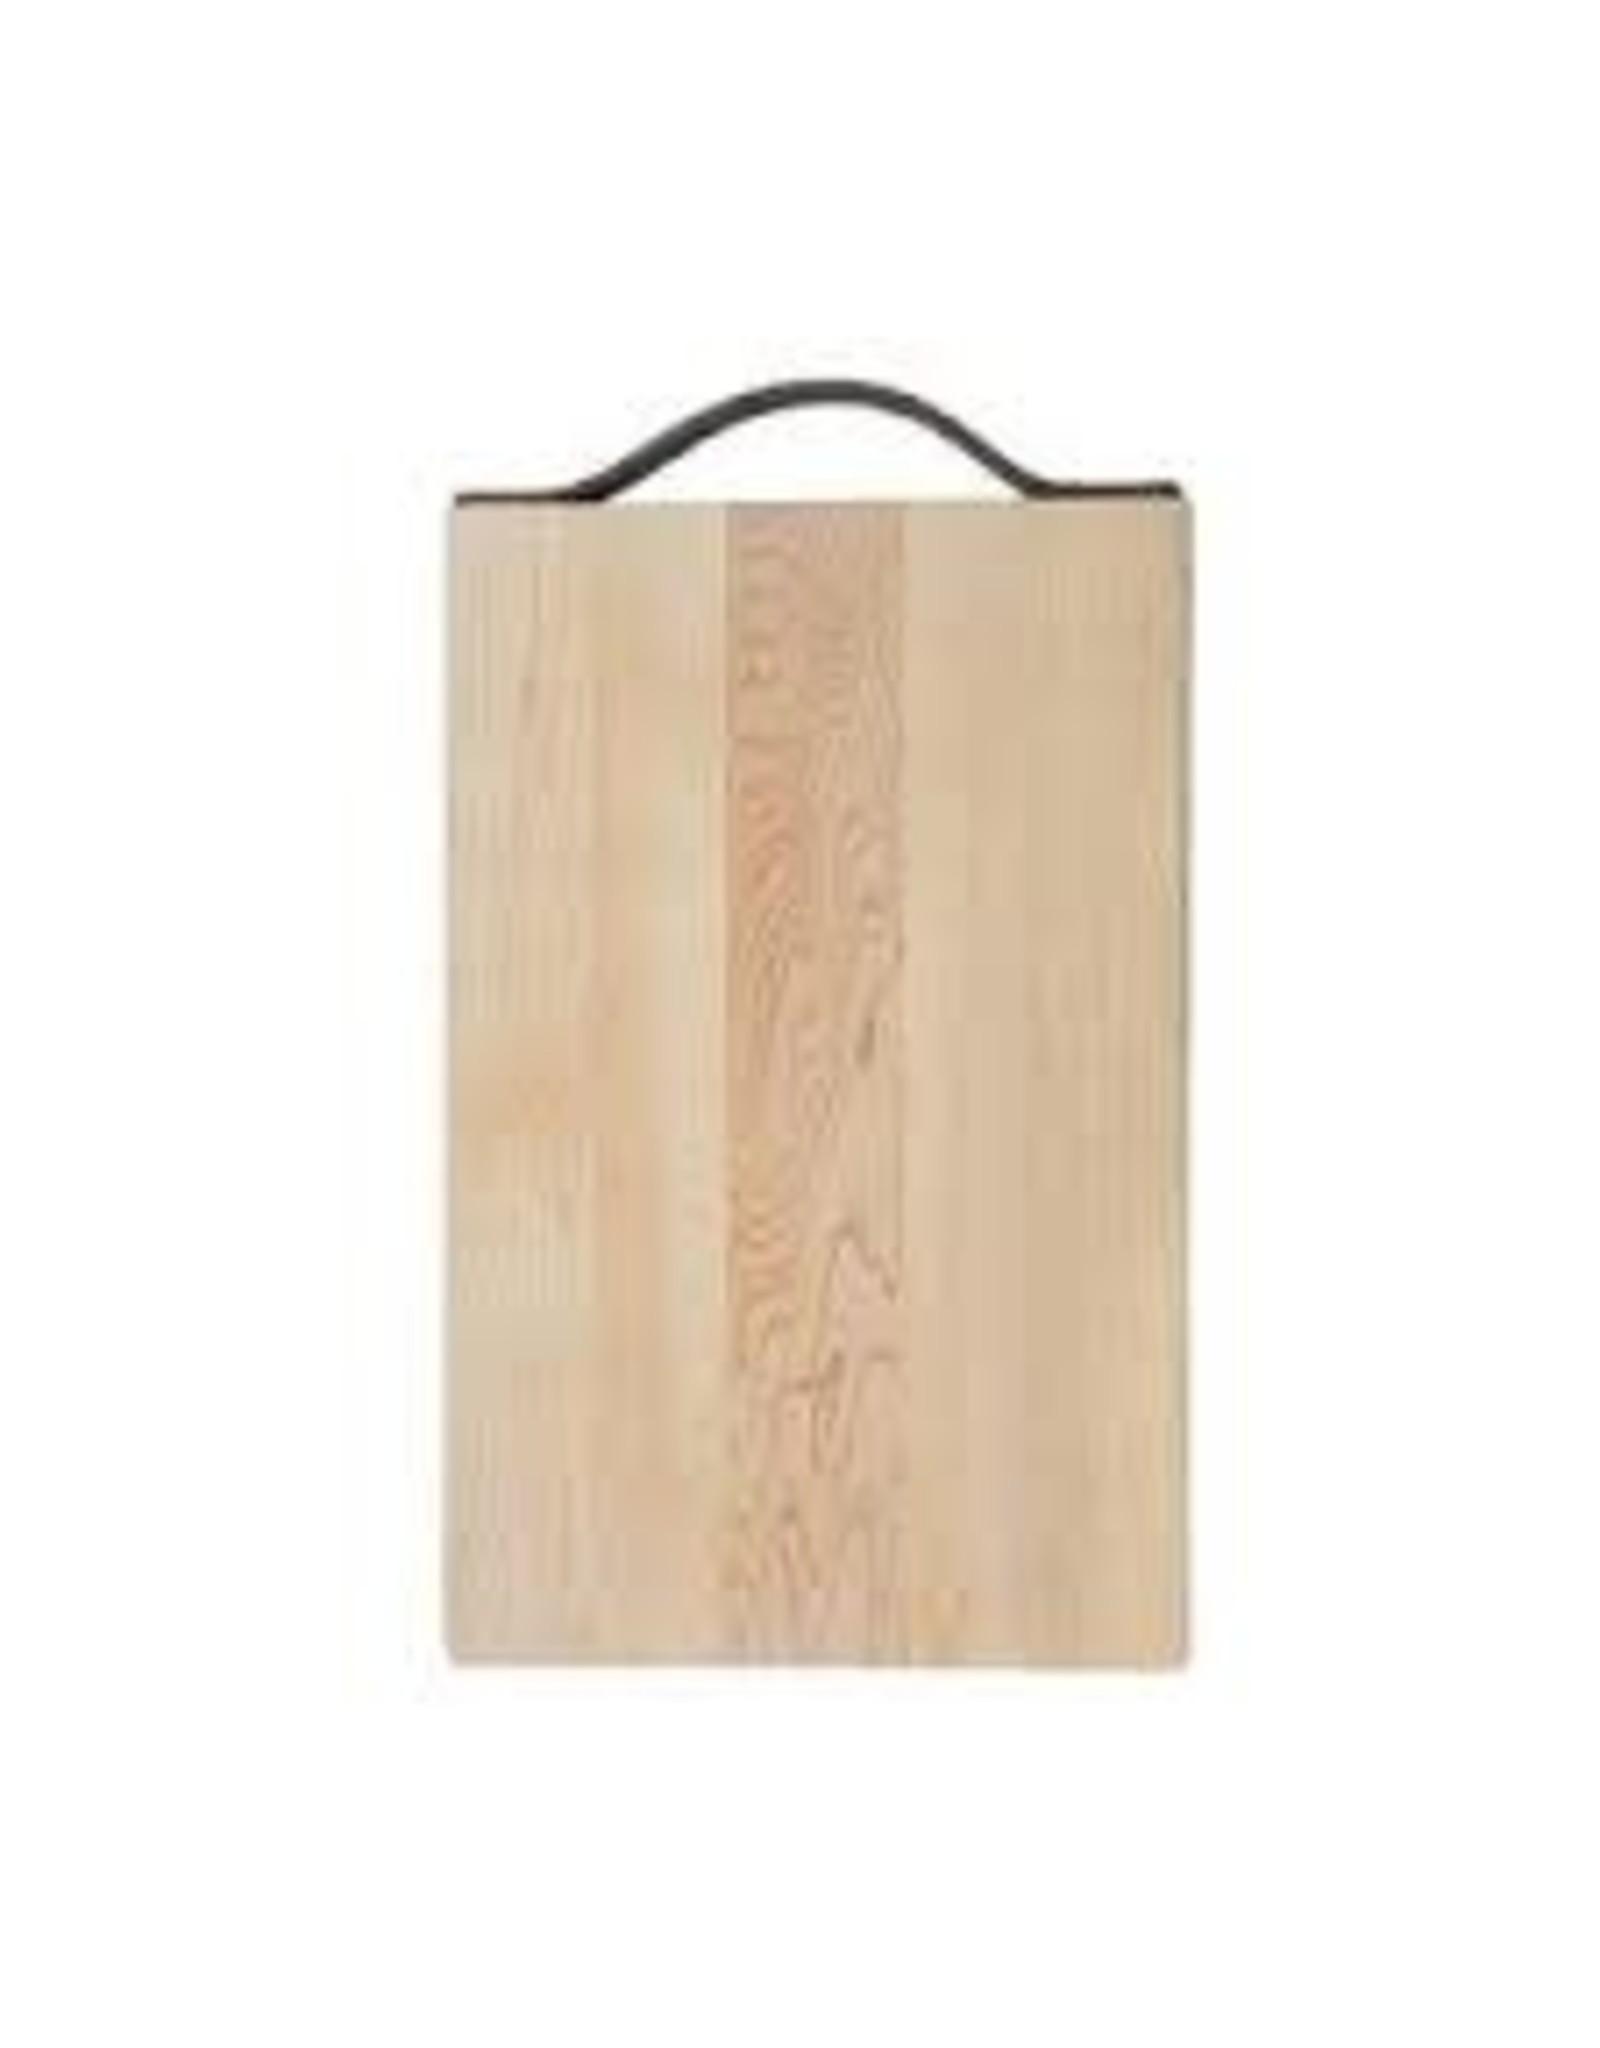 JK-ADAMS JK-ADAMS Killington Board W Leather Handles